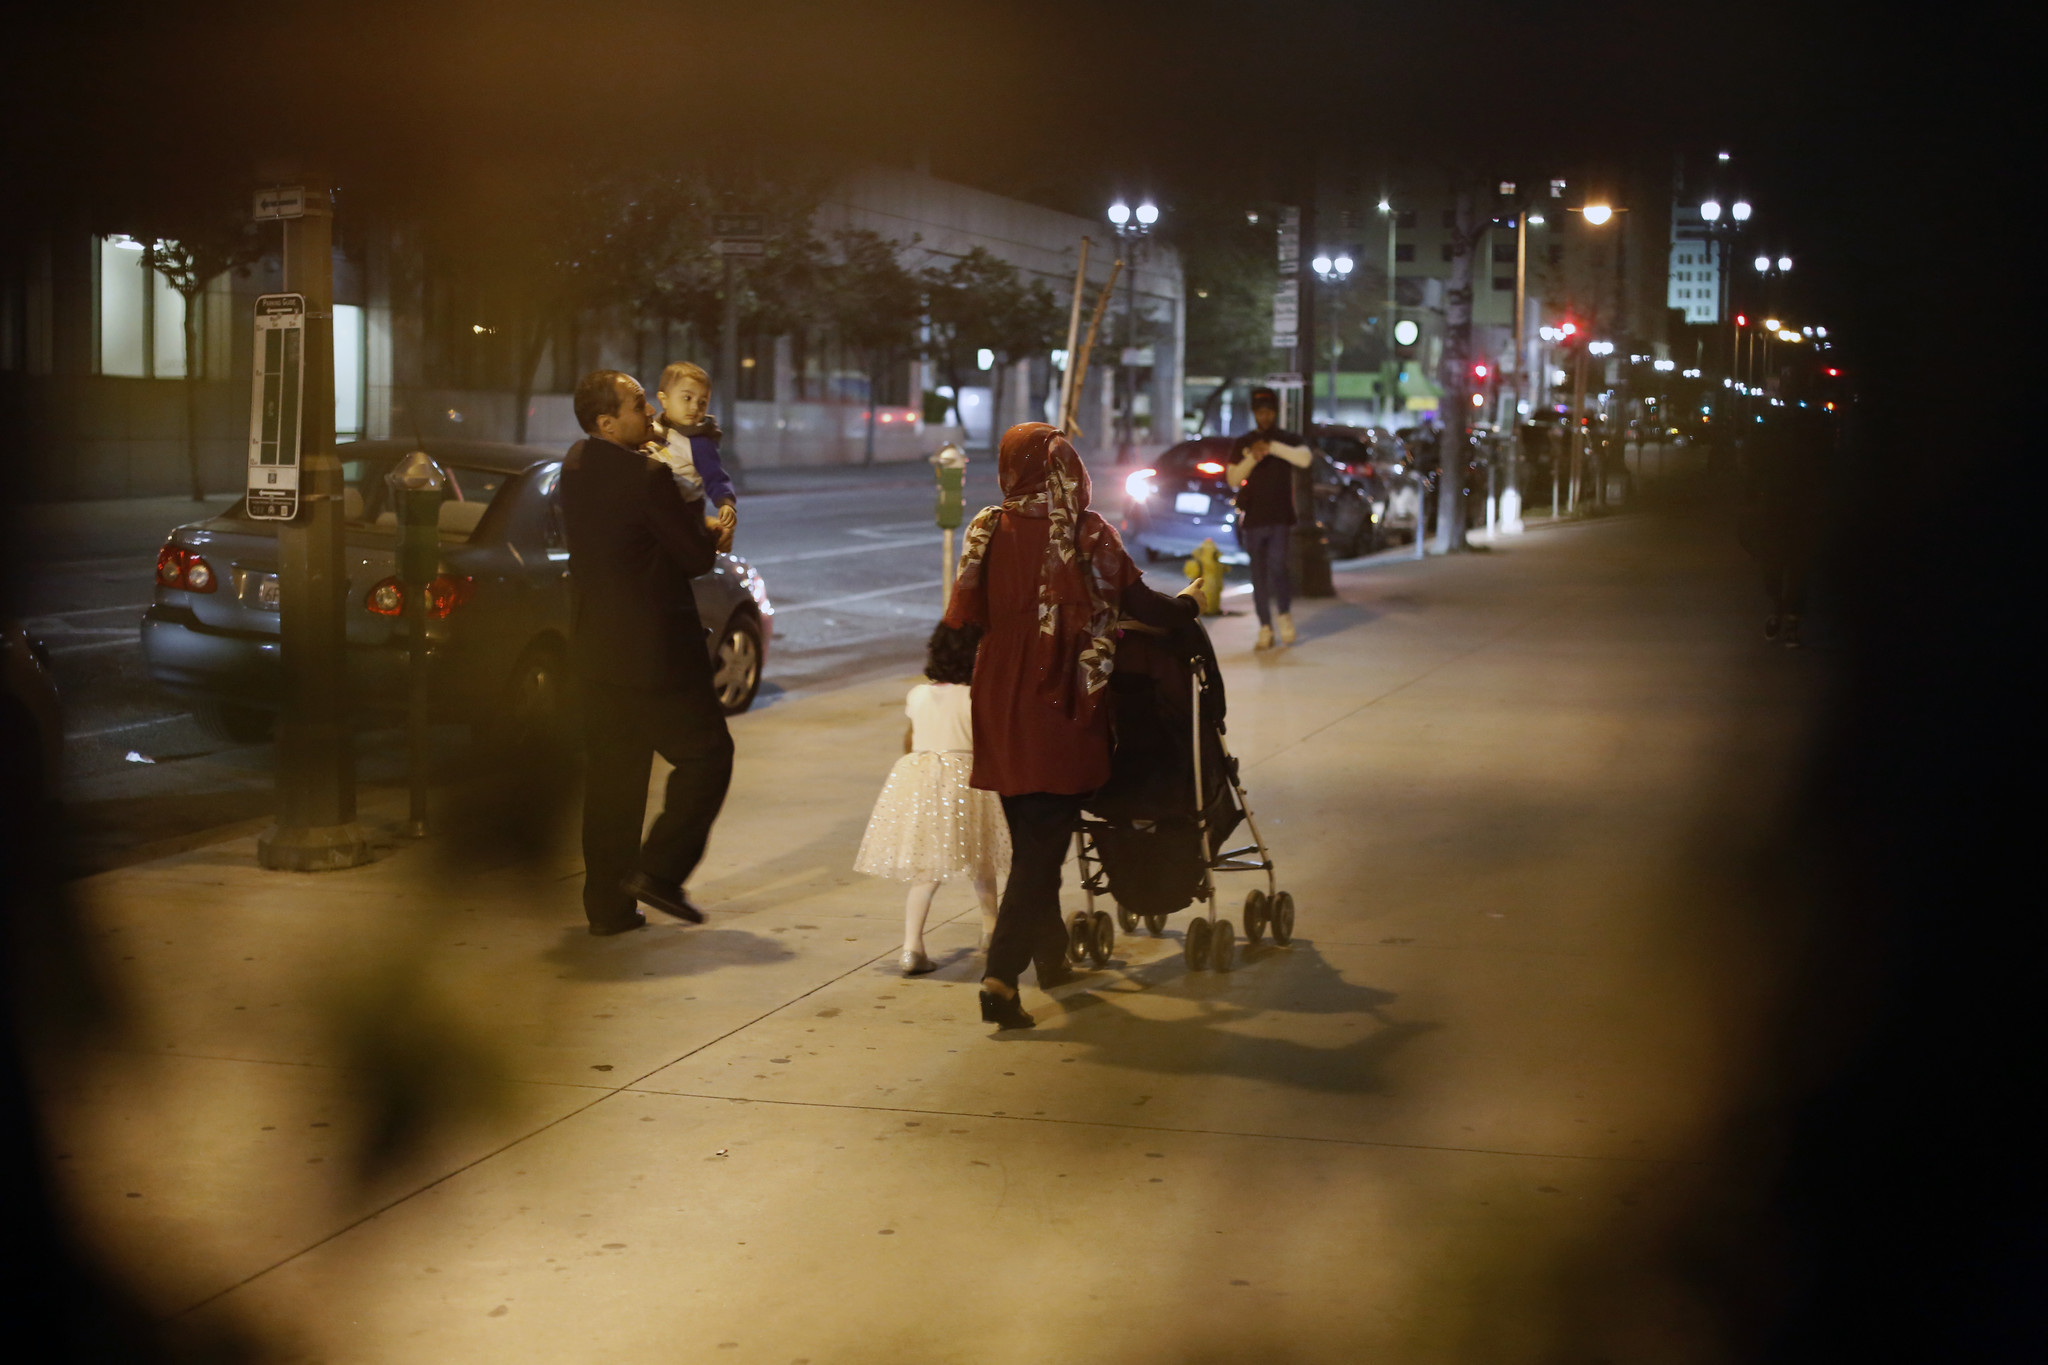 LOS ANGELES, CA-MARCH 31, 2019: Bashir Kashefi, left, Naseema Kashefi walk out with their two kids H